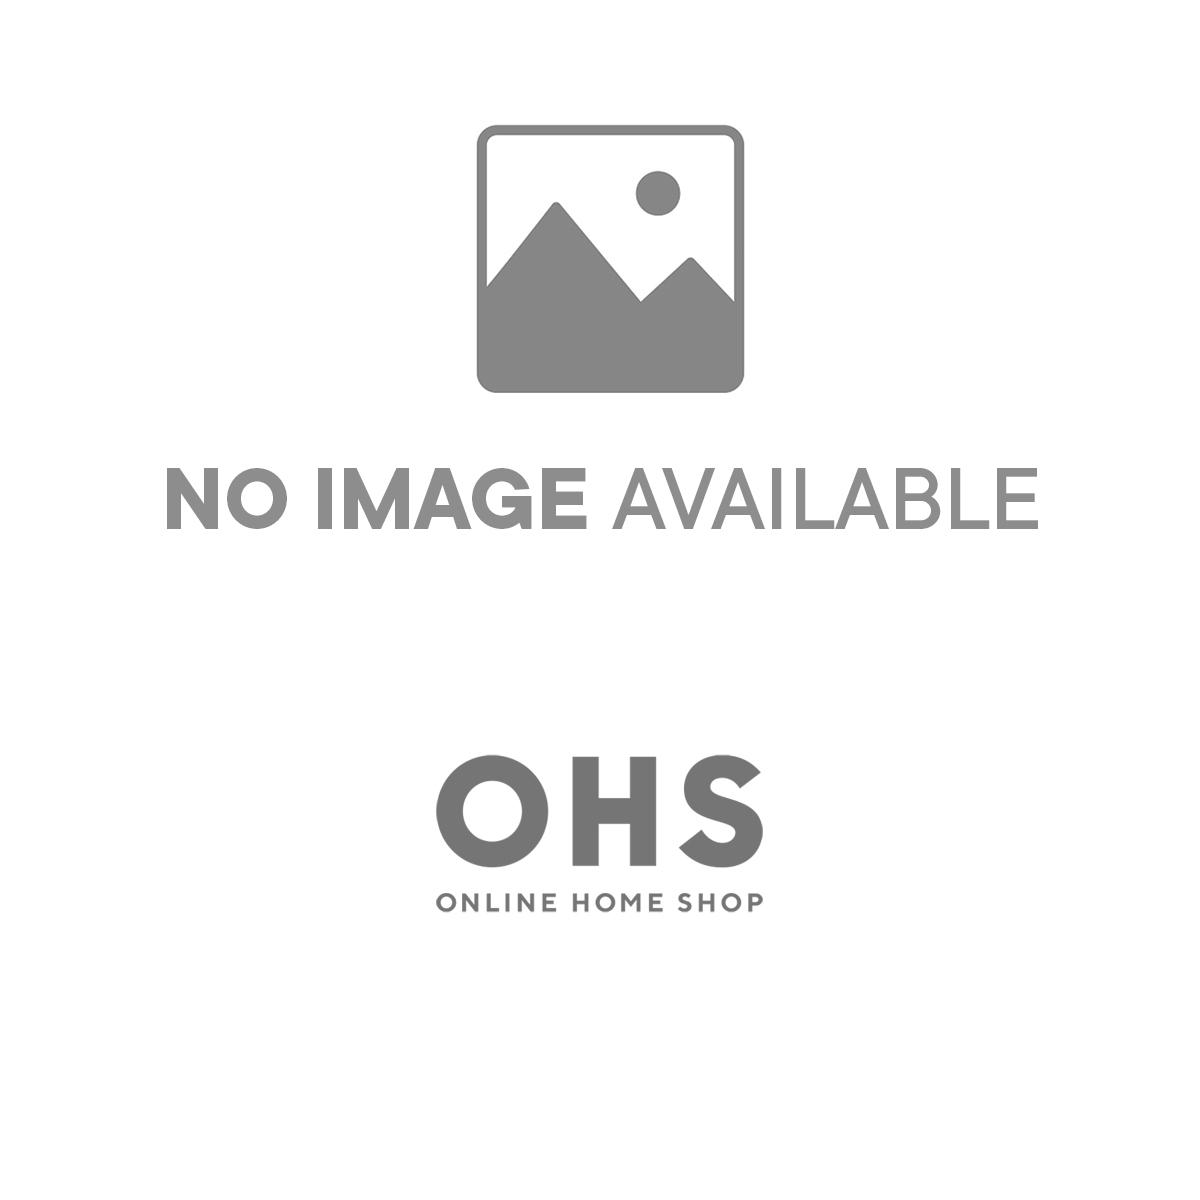 Sienna Crushed Velvet Band Duvet Set - Natural Champagne